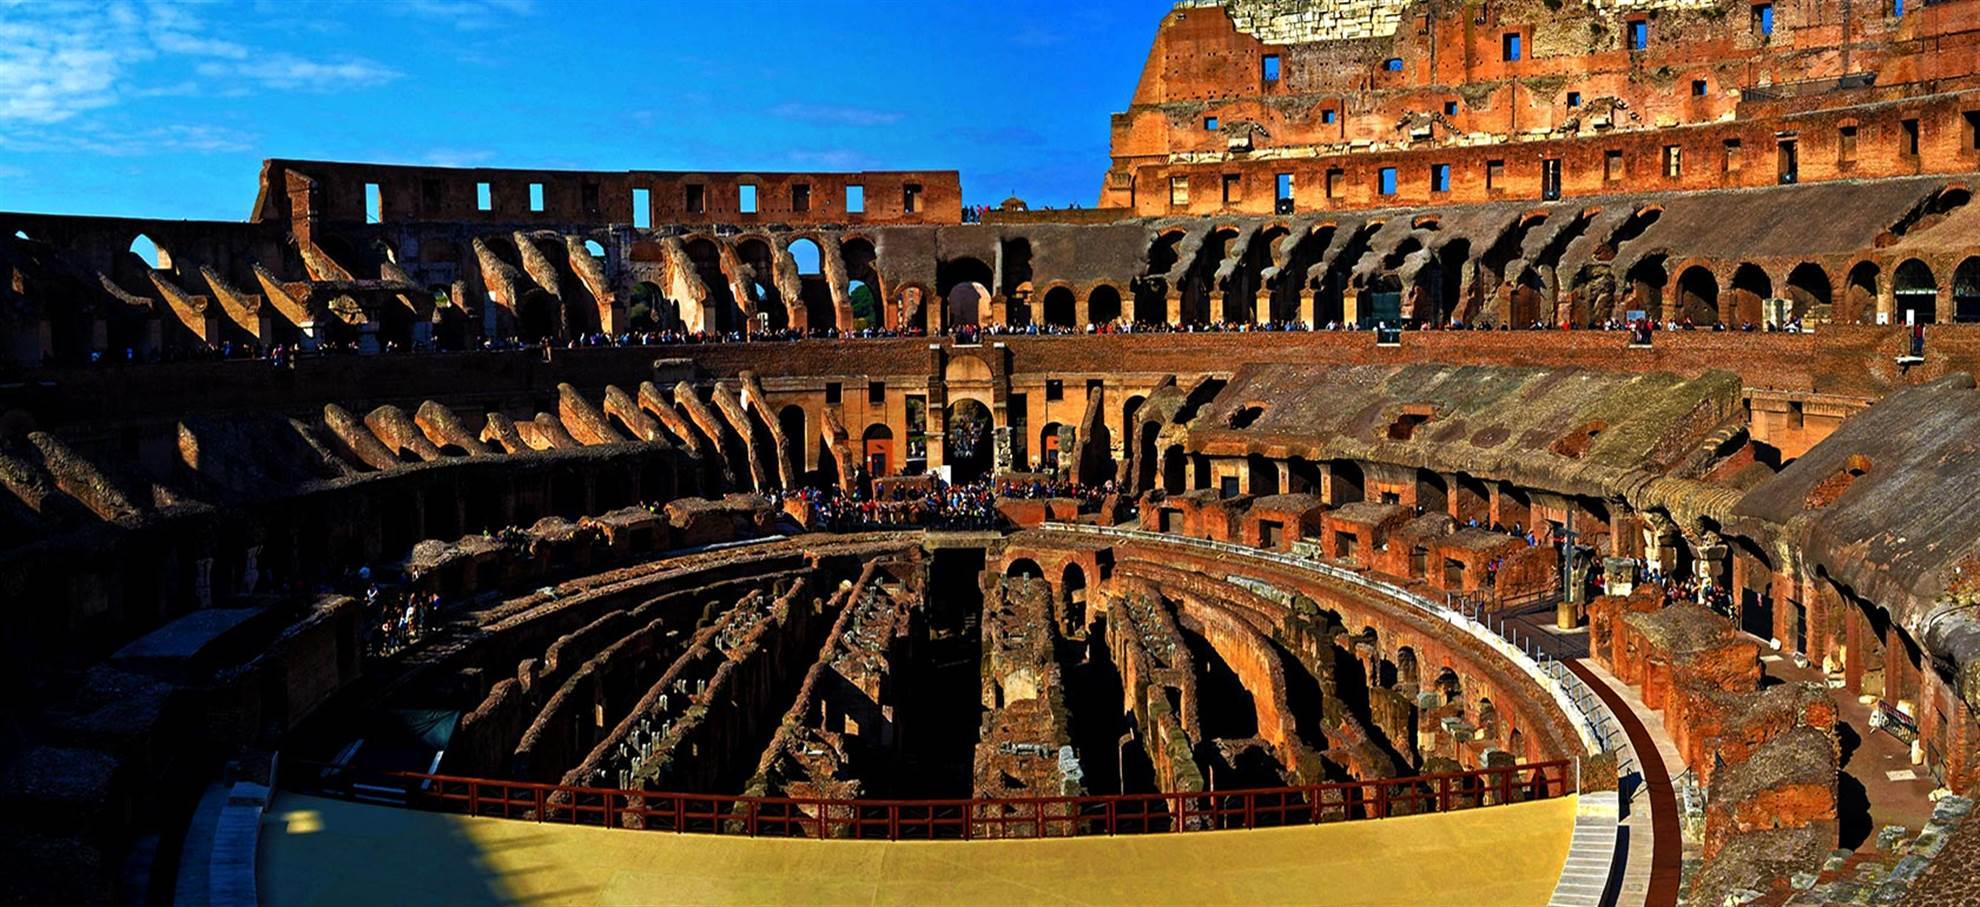 Colosseum + Belvedere Panoramautsikt (Engelsk turné)